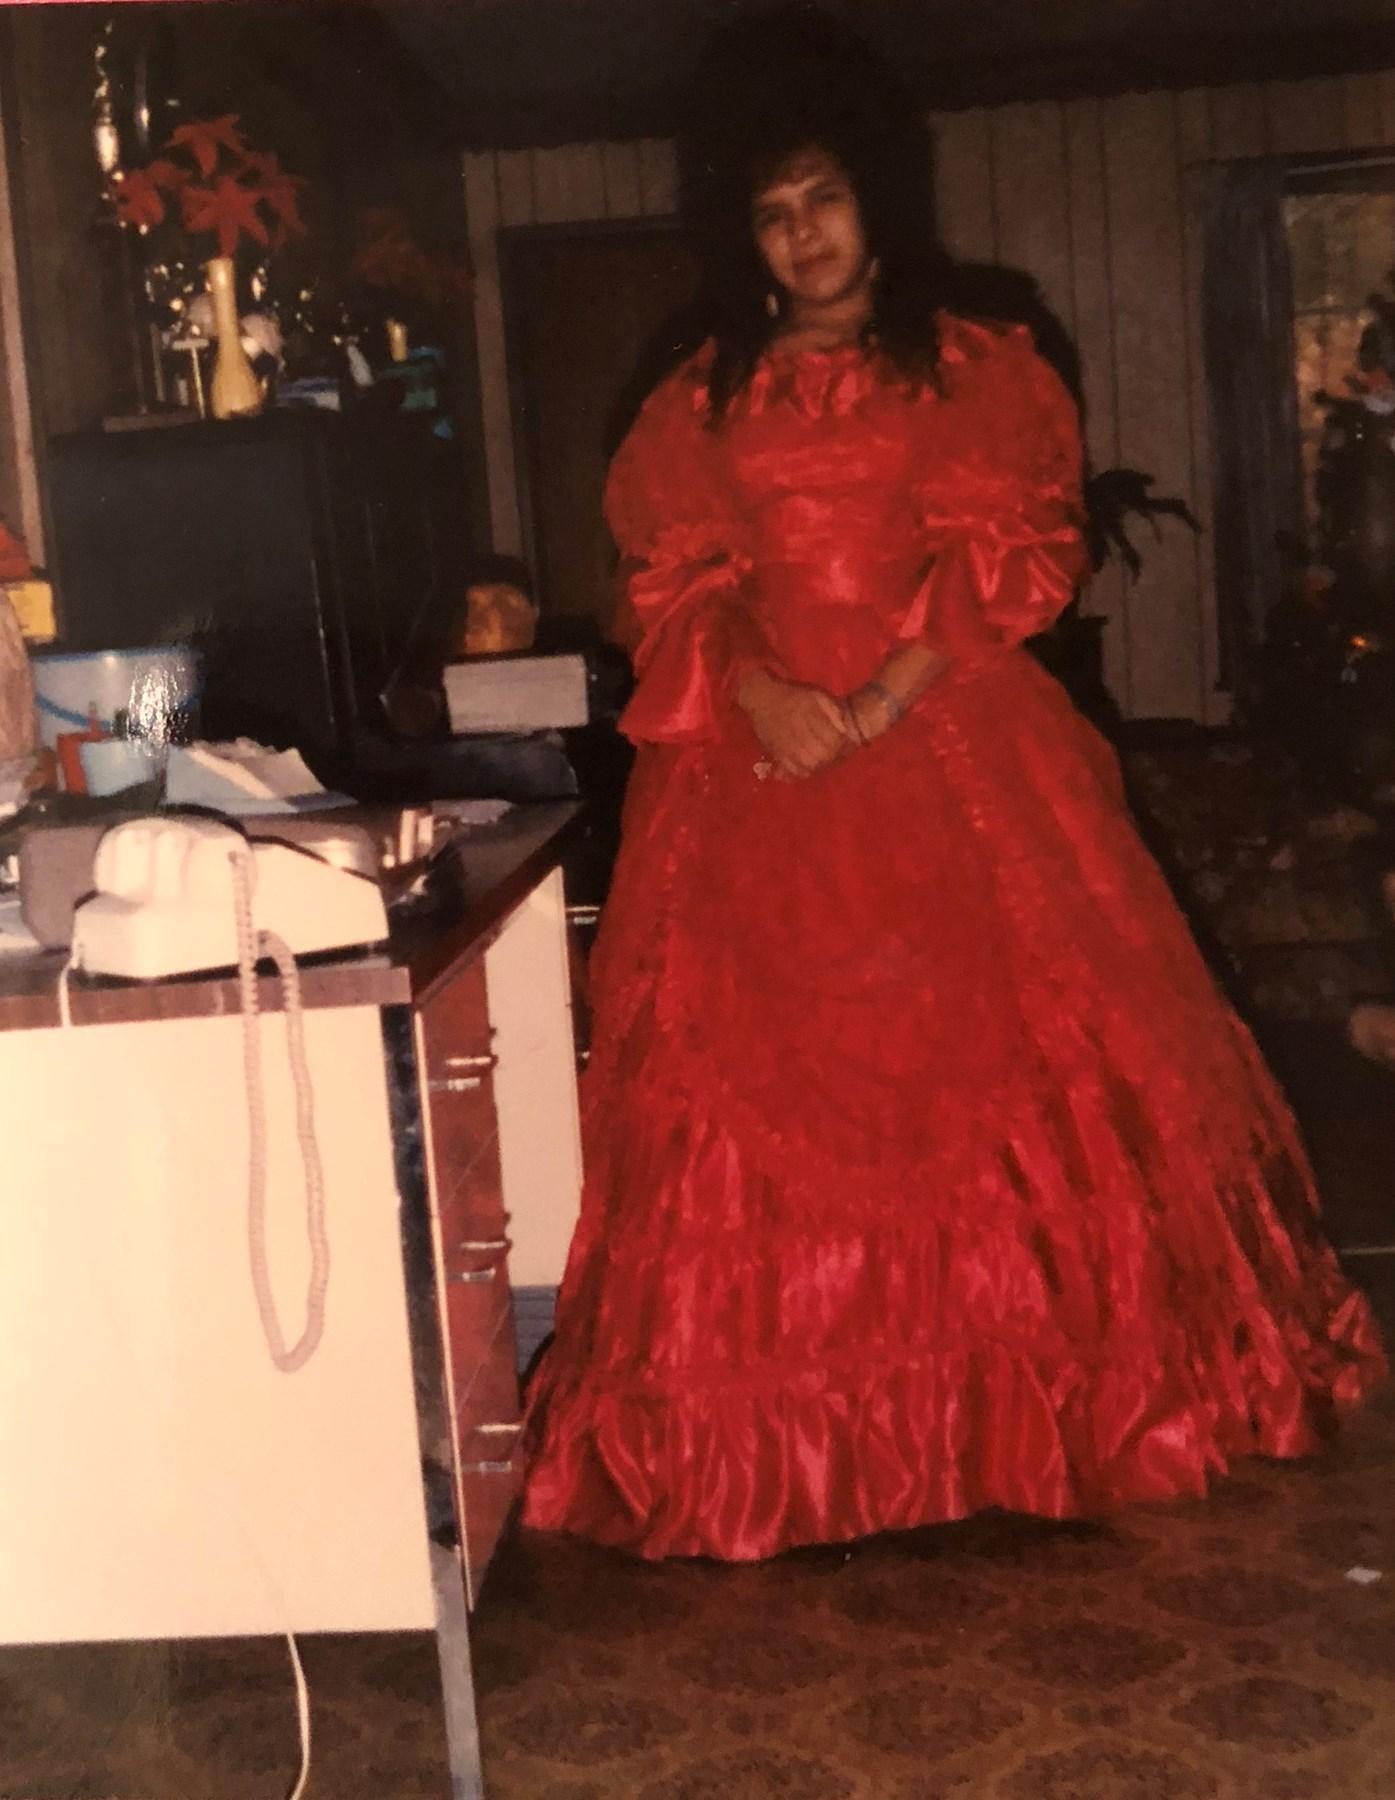 Id29ywhe Ann Obituary Torres Pasadenatx Mary wmnN0v8